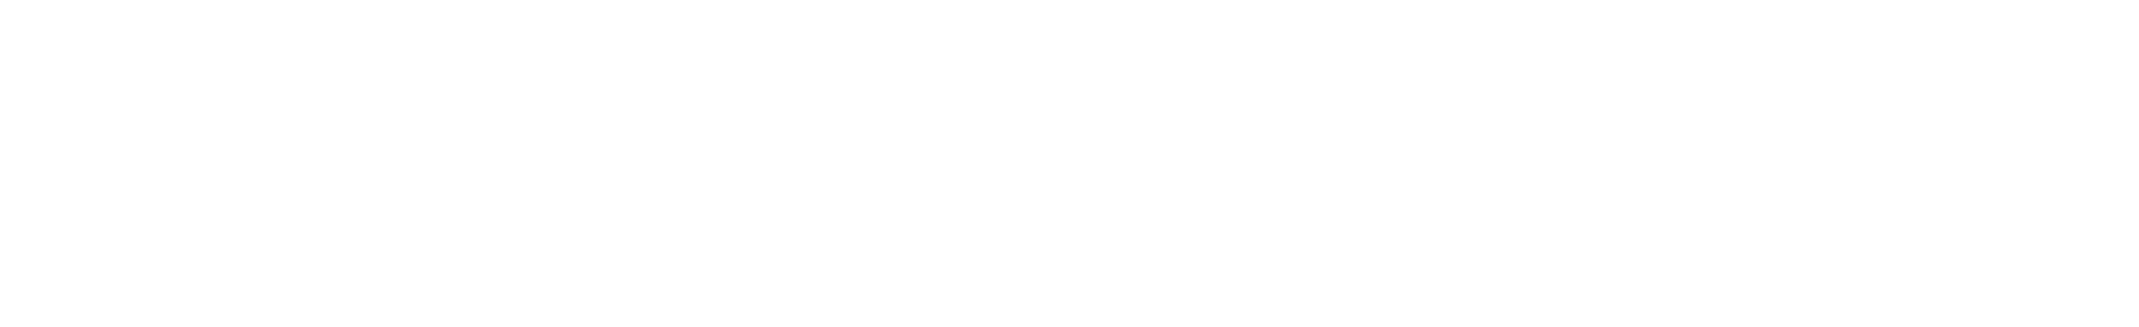 株式会社クルクル